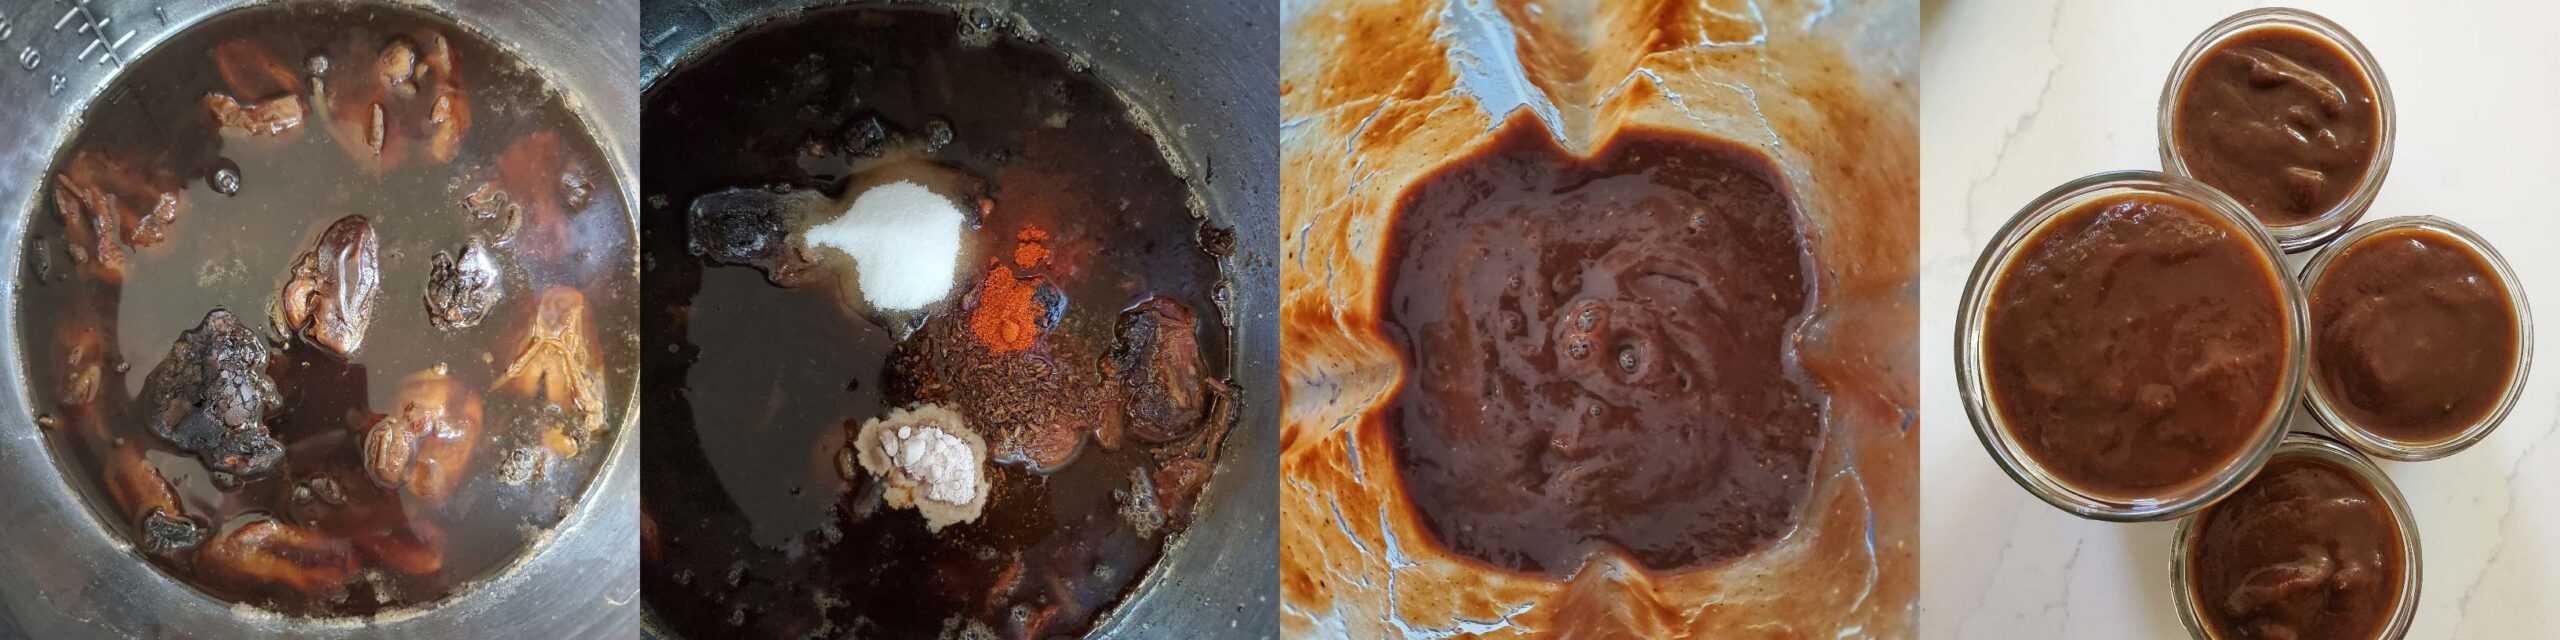 Date Tamarind Chutney - Step2 - Instant Pot